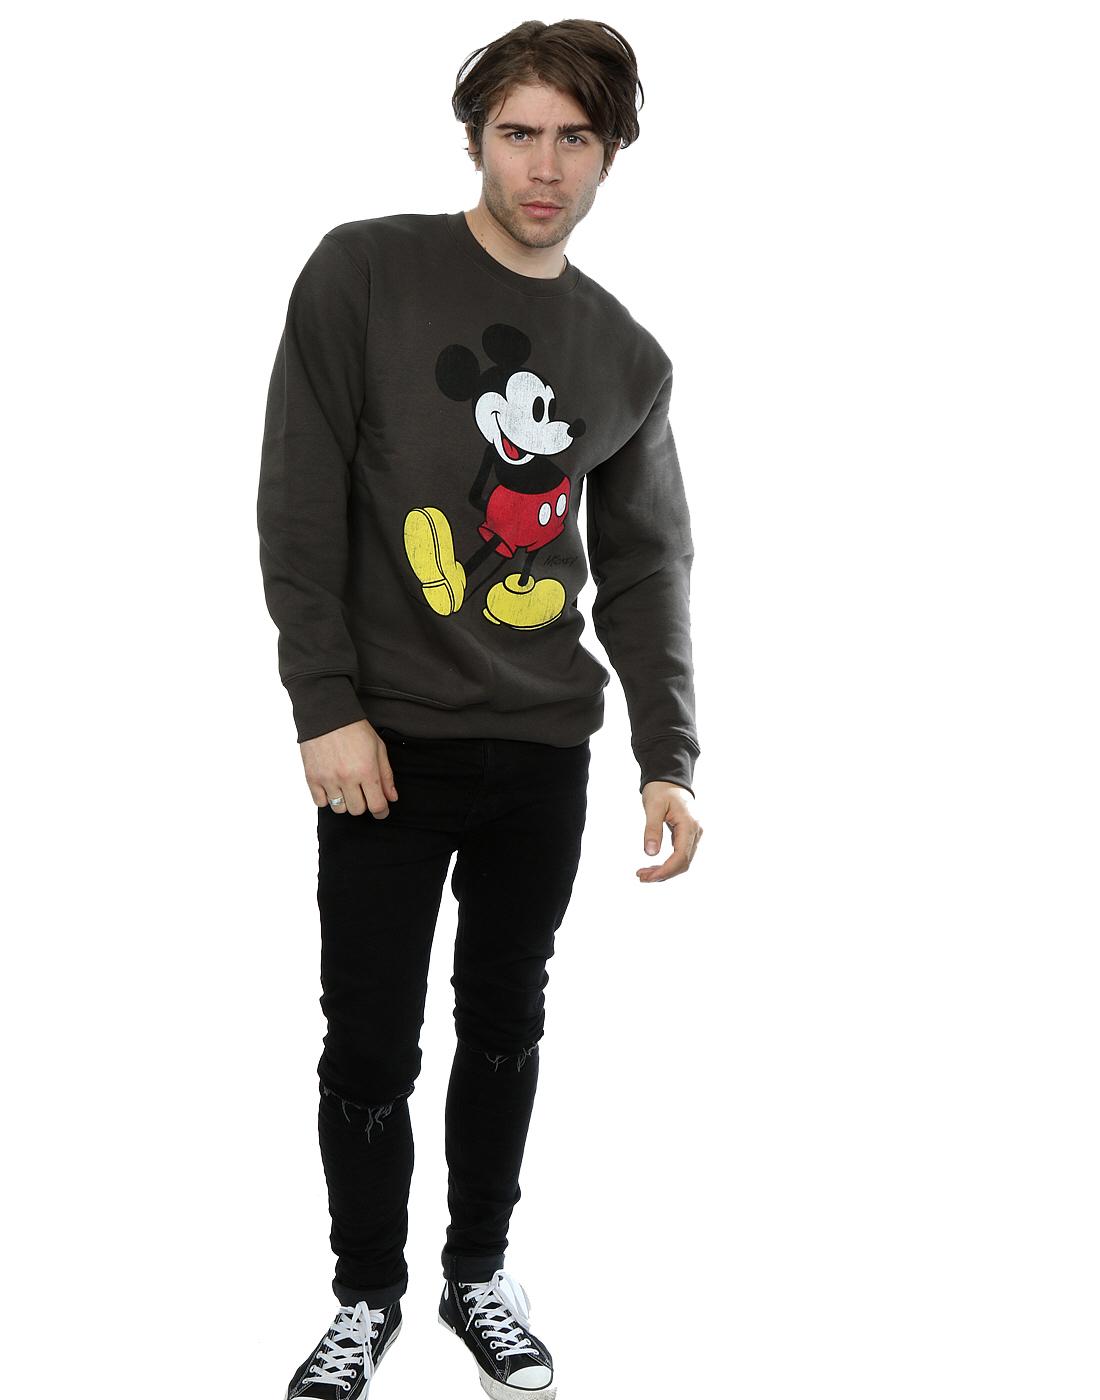 Disney-Homme-Mickey-Mouse-Classic-Kick-Sweat-Shirt